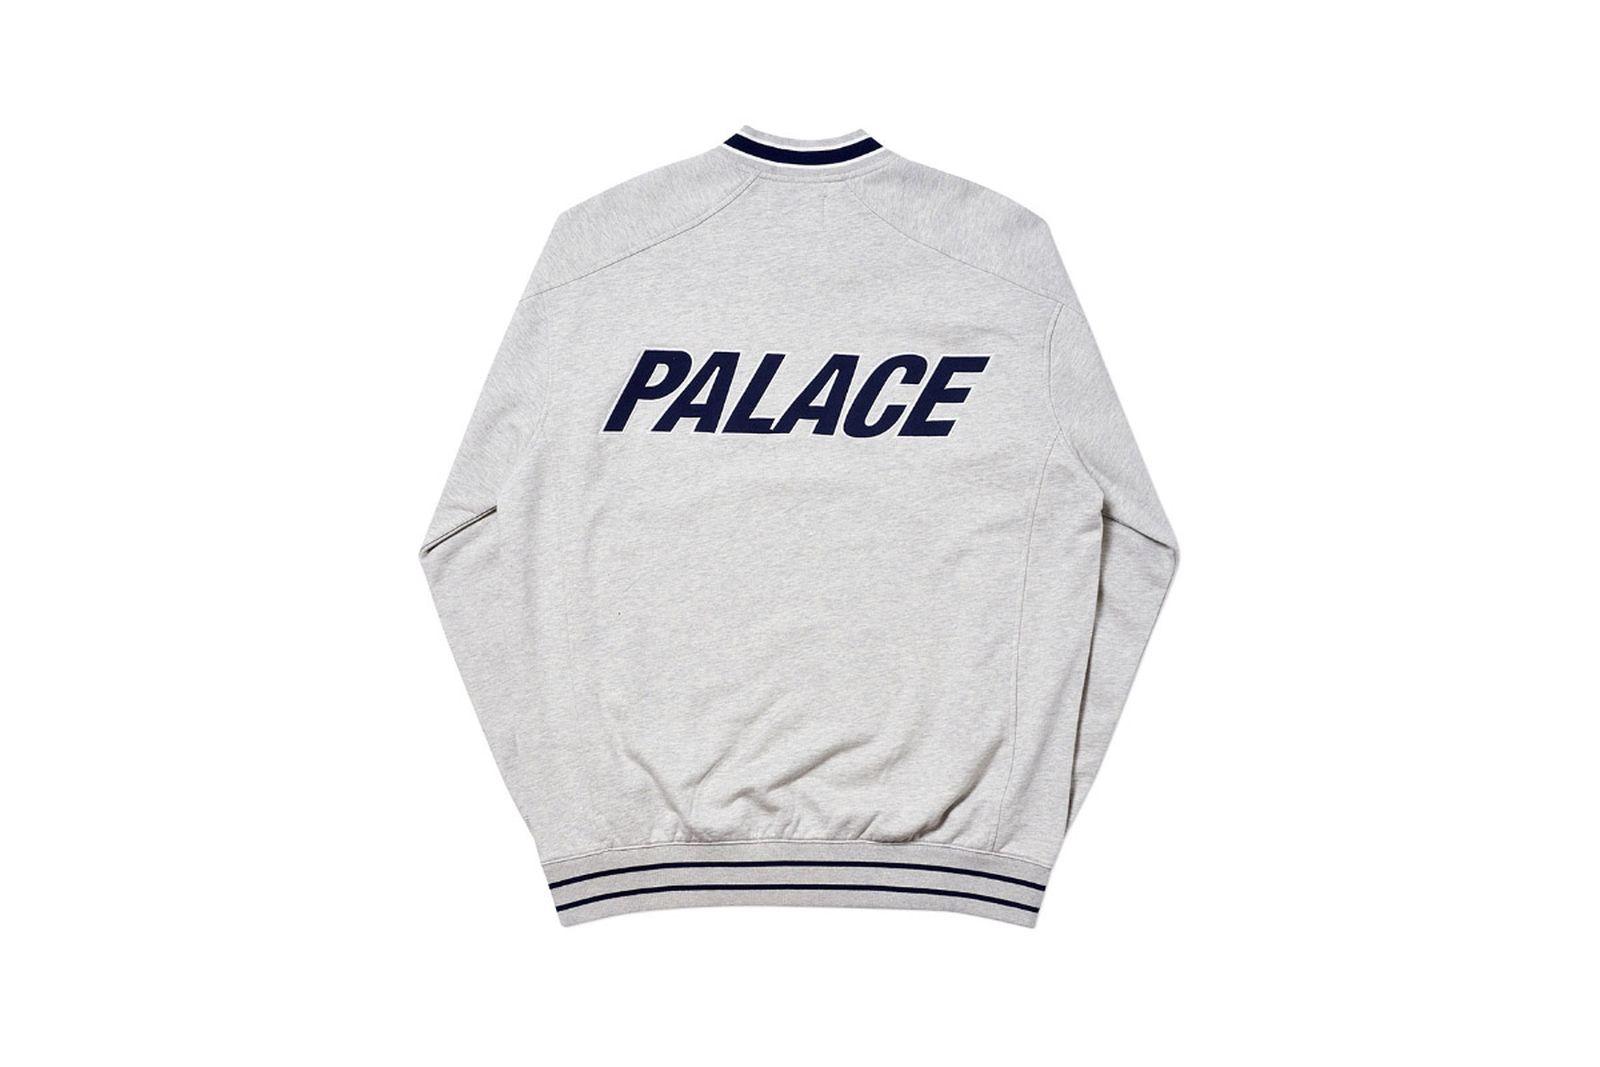 Palace 2019 Autumn crew optimo grey back2061 1